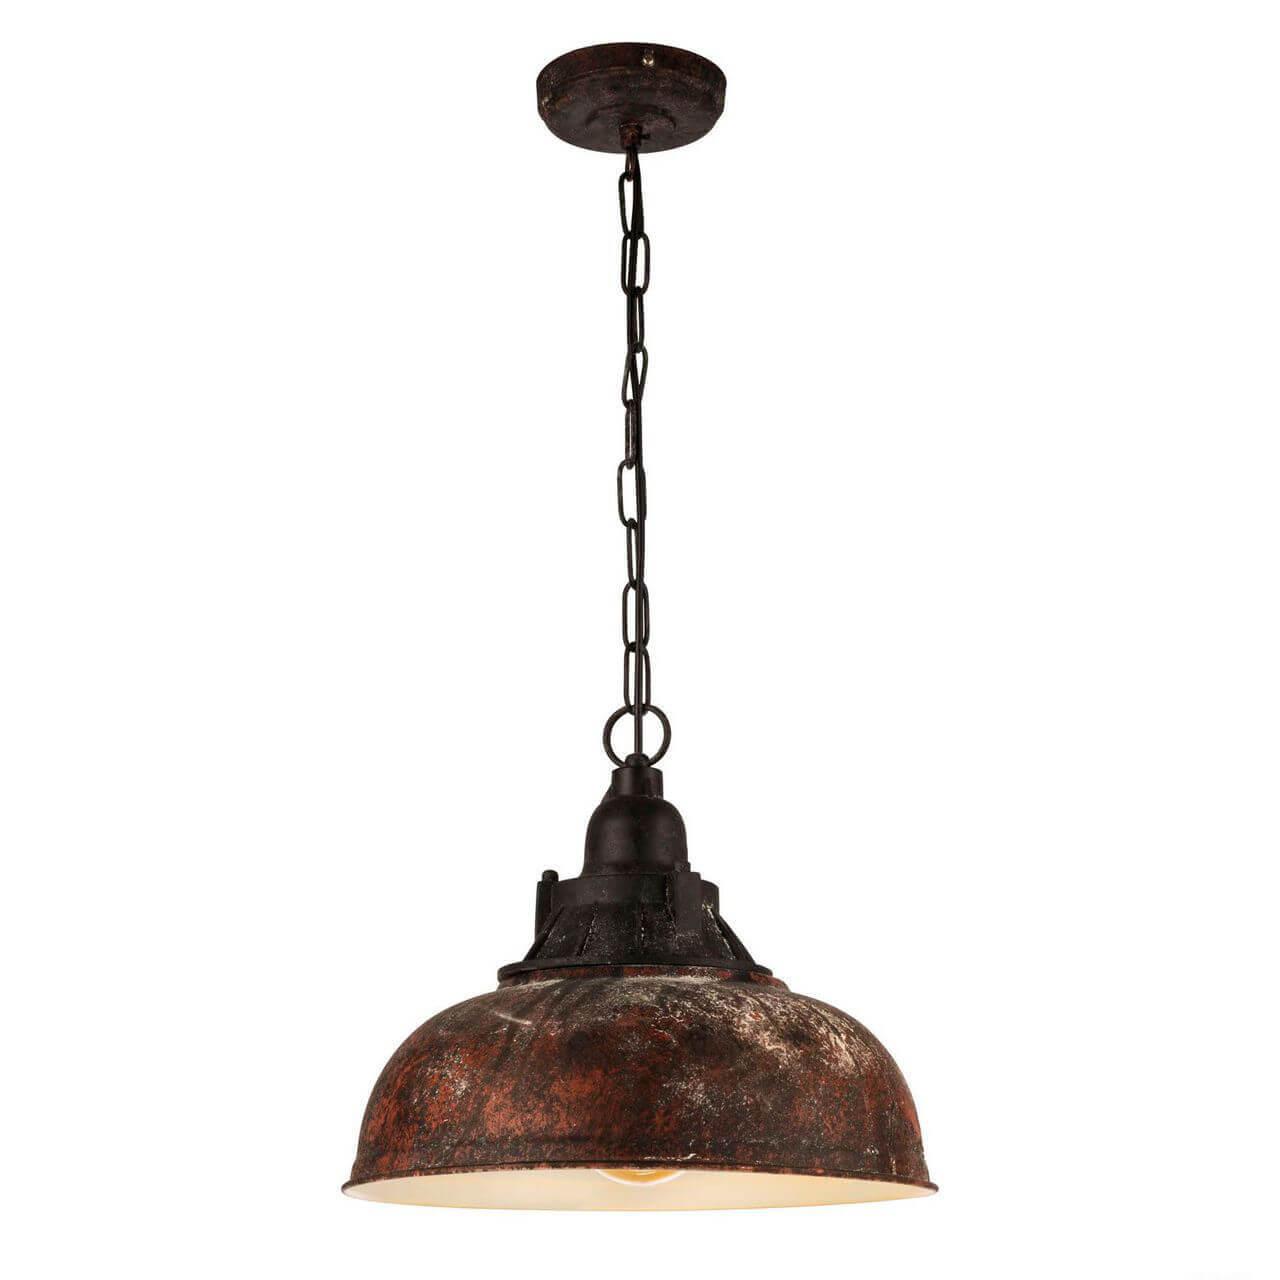 цены Светильник Eglo 49819 Grantham